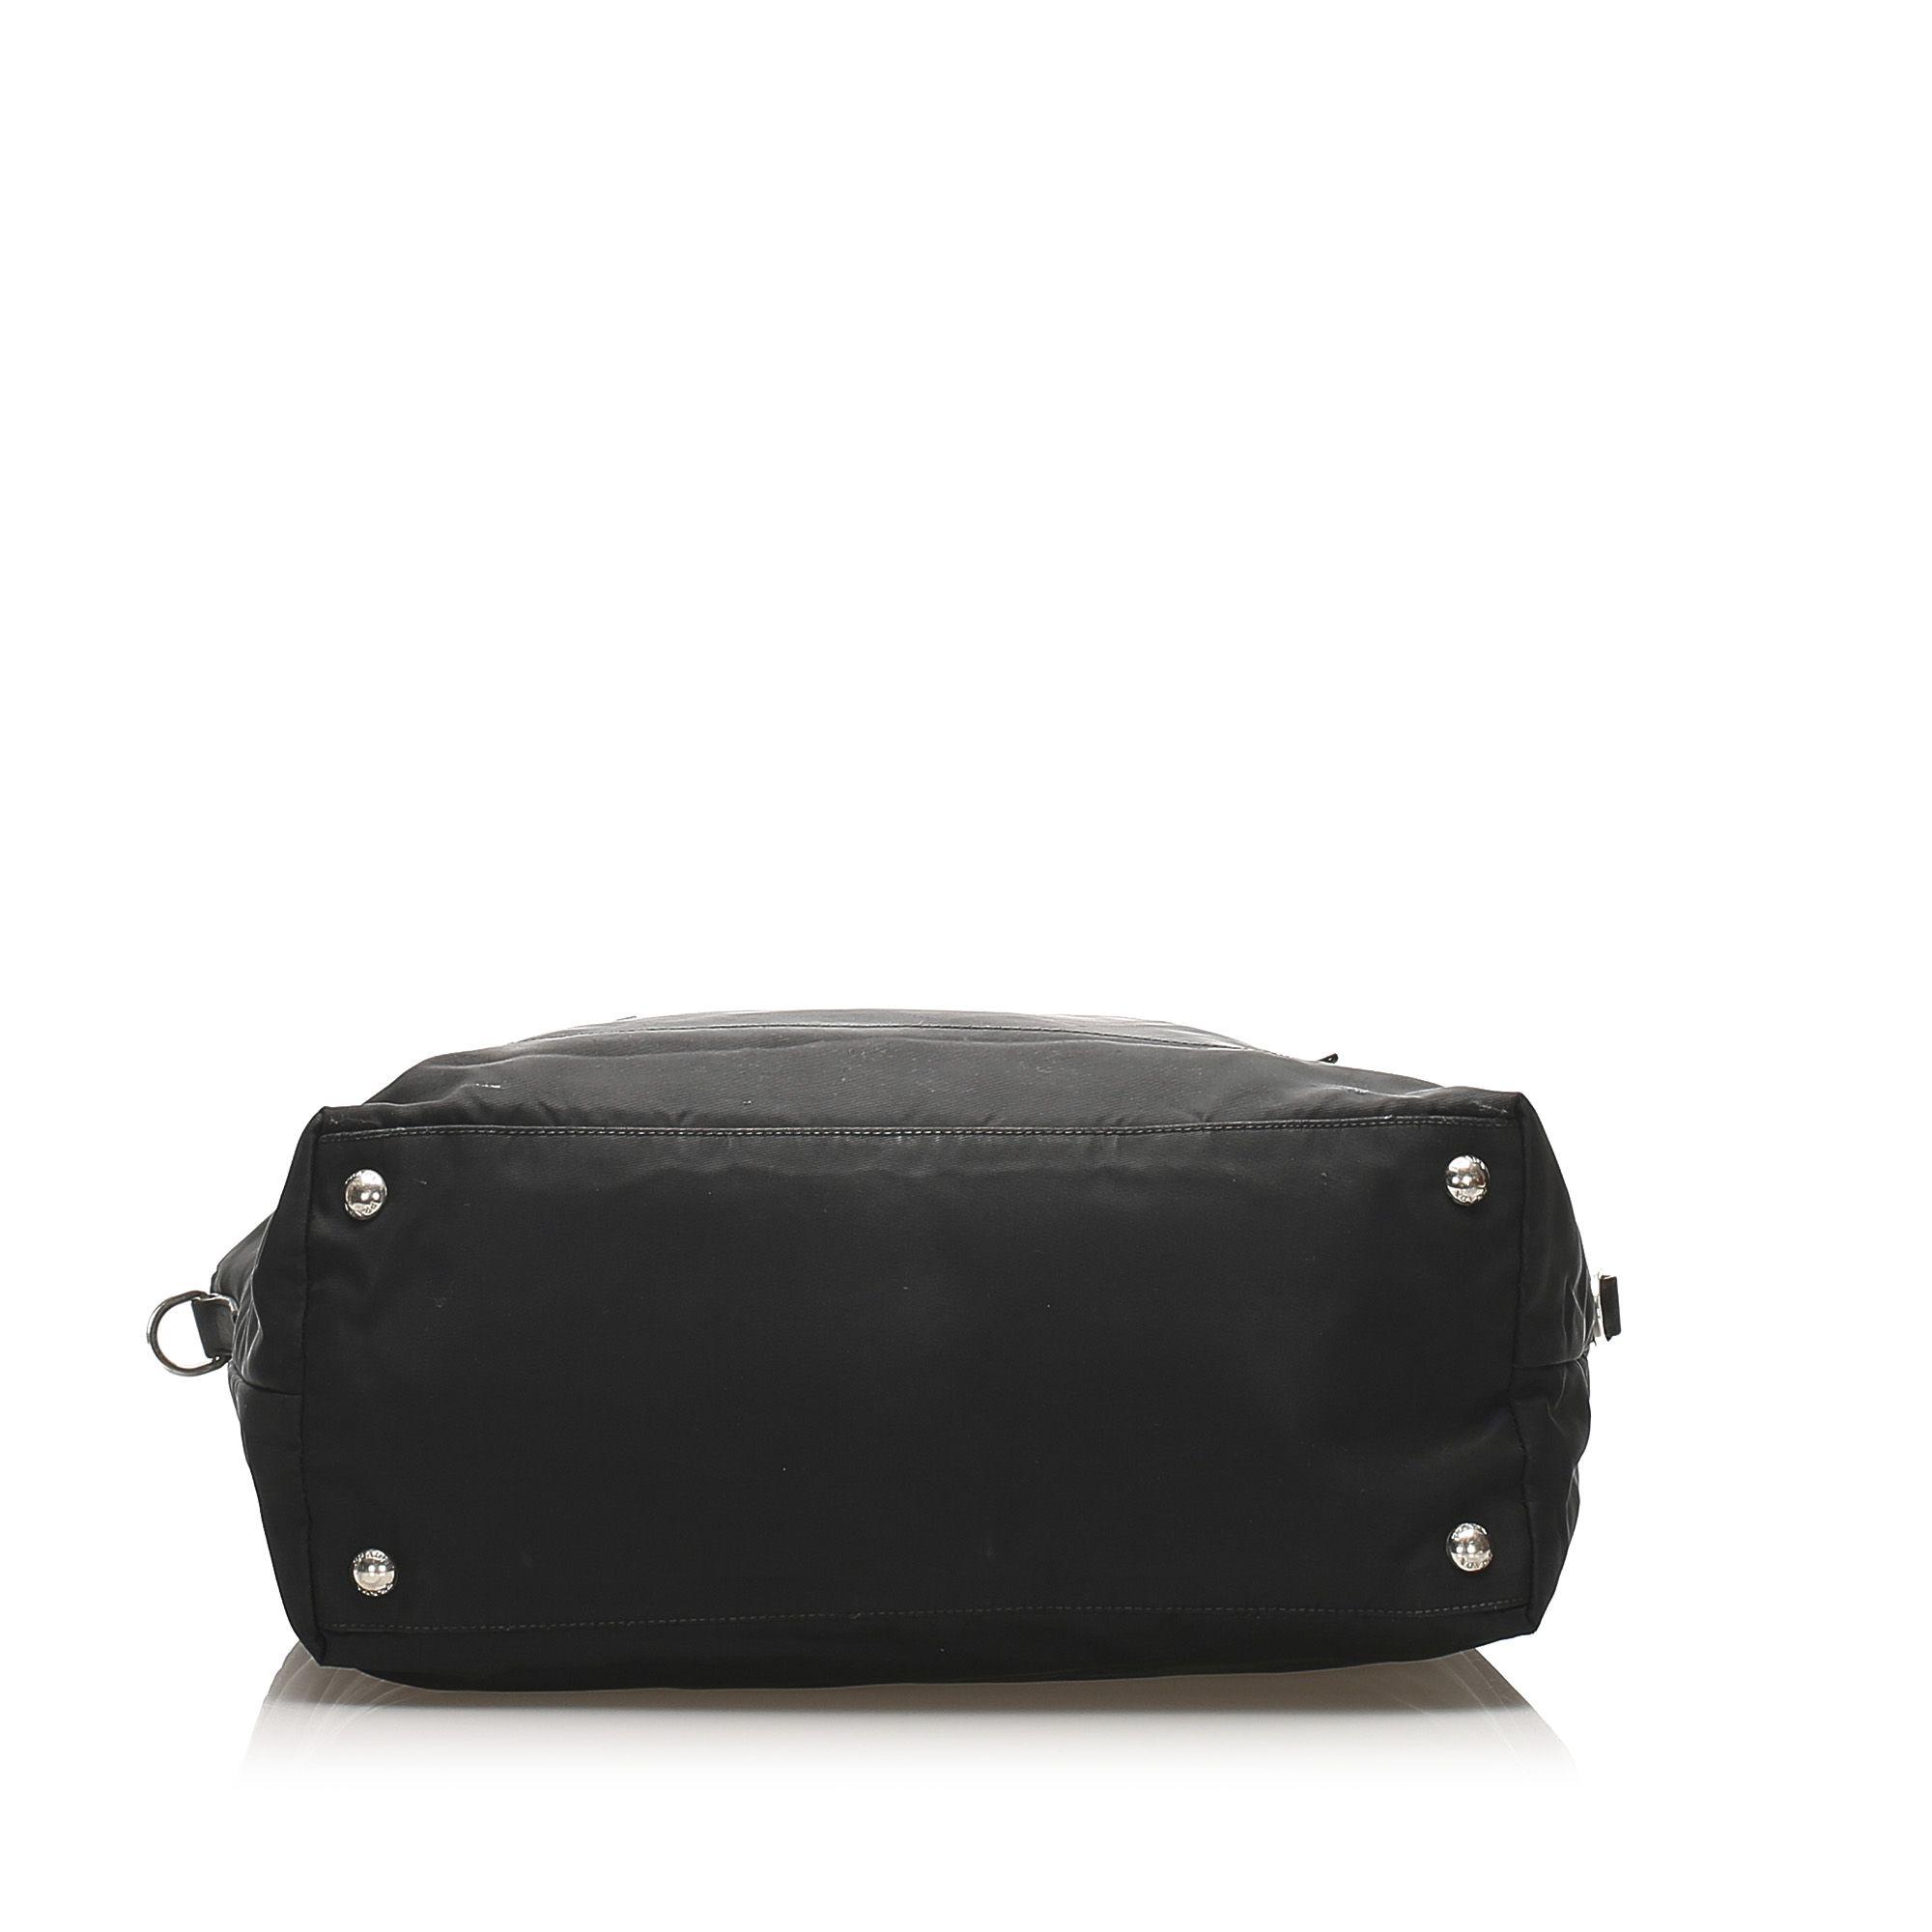 Vintage Prada Tessuto Tote Bag Black